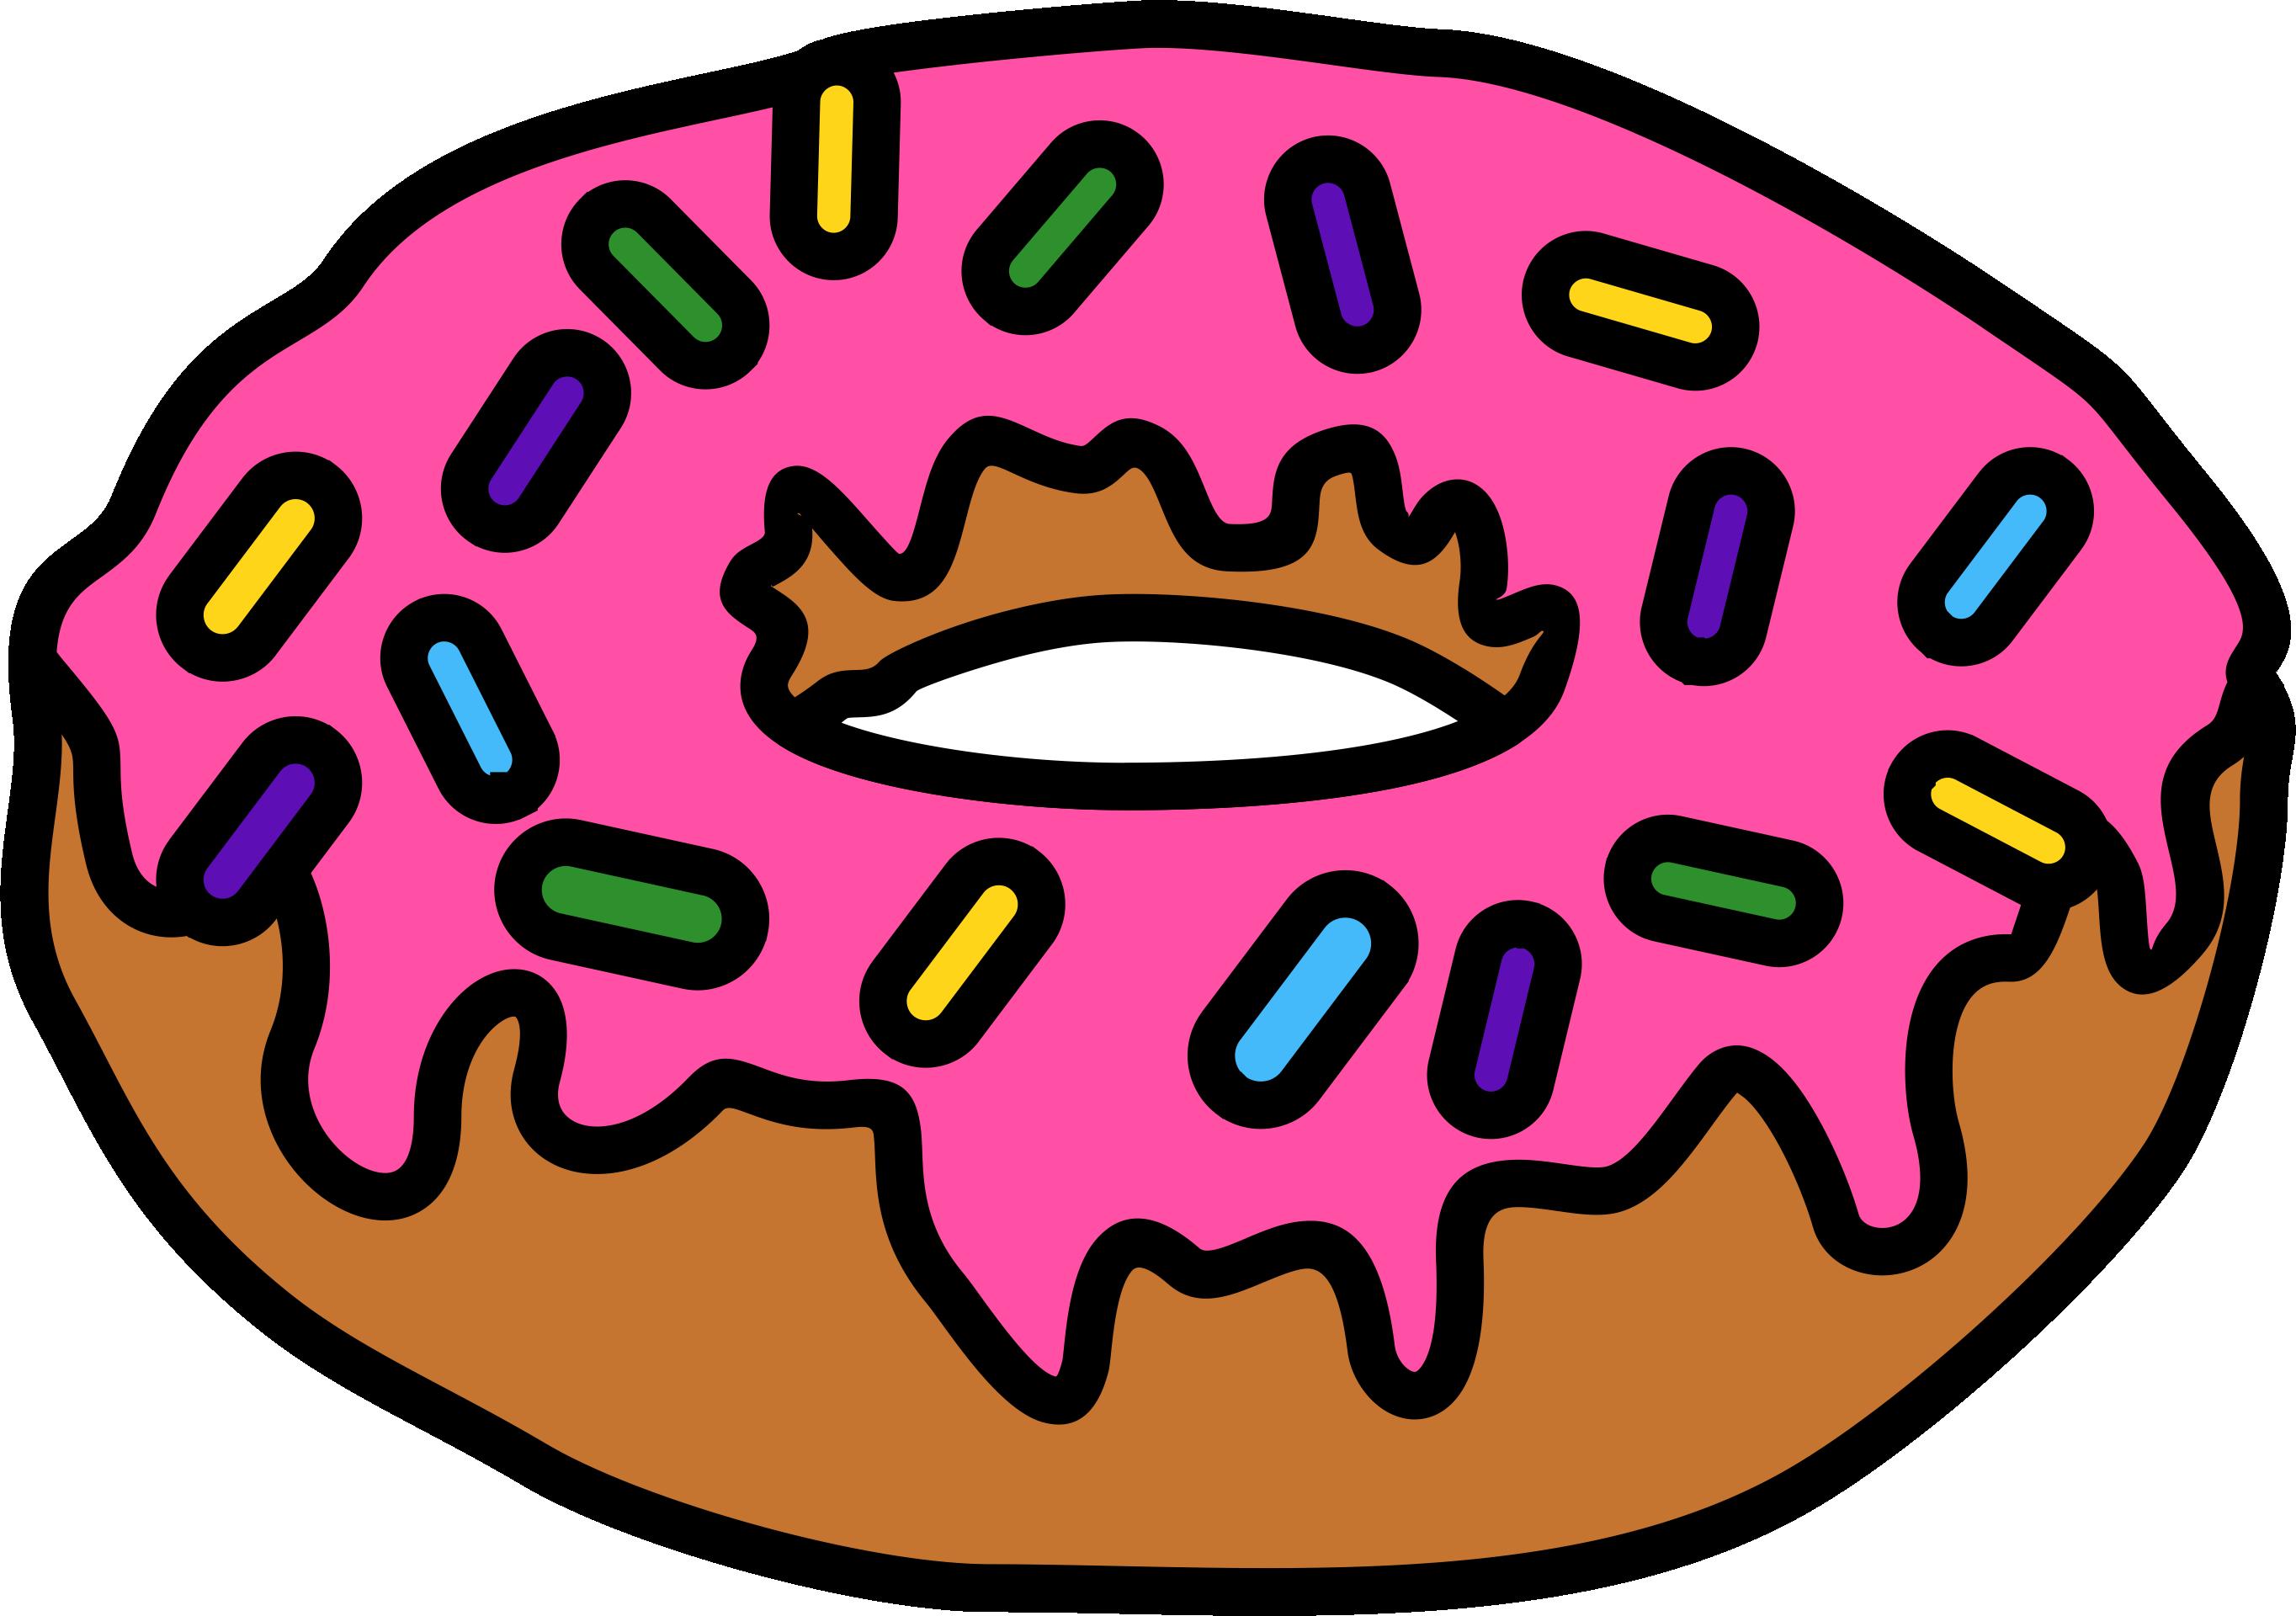 Donuts Doughnut Lounge National Doughnut Day Cafe Clip art.